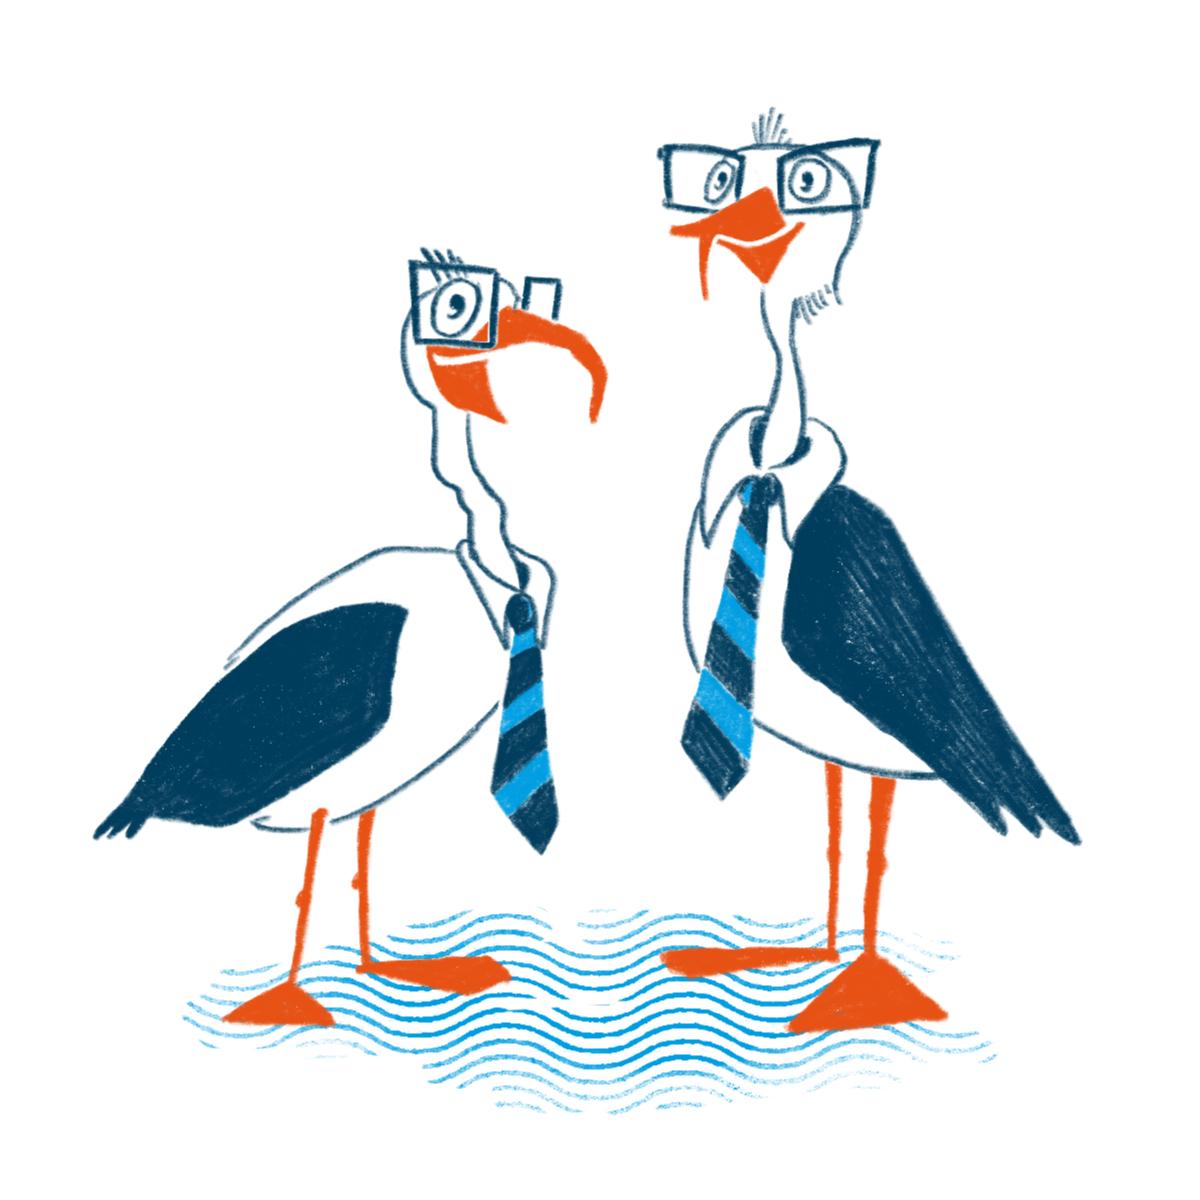 02-20180404-howoge-blankenhagen-skizzig-illustration-berlin-birds-office.jpg